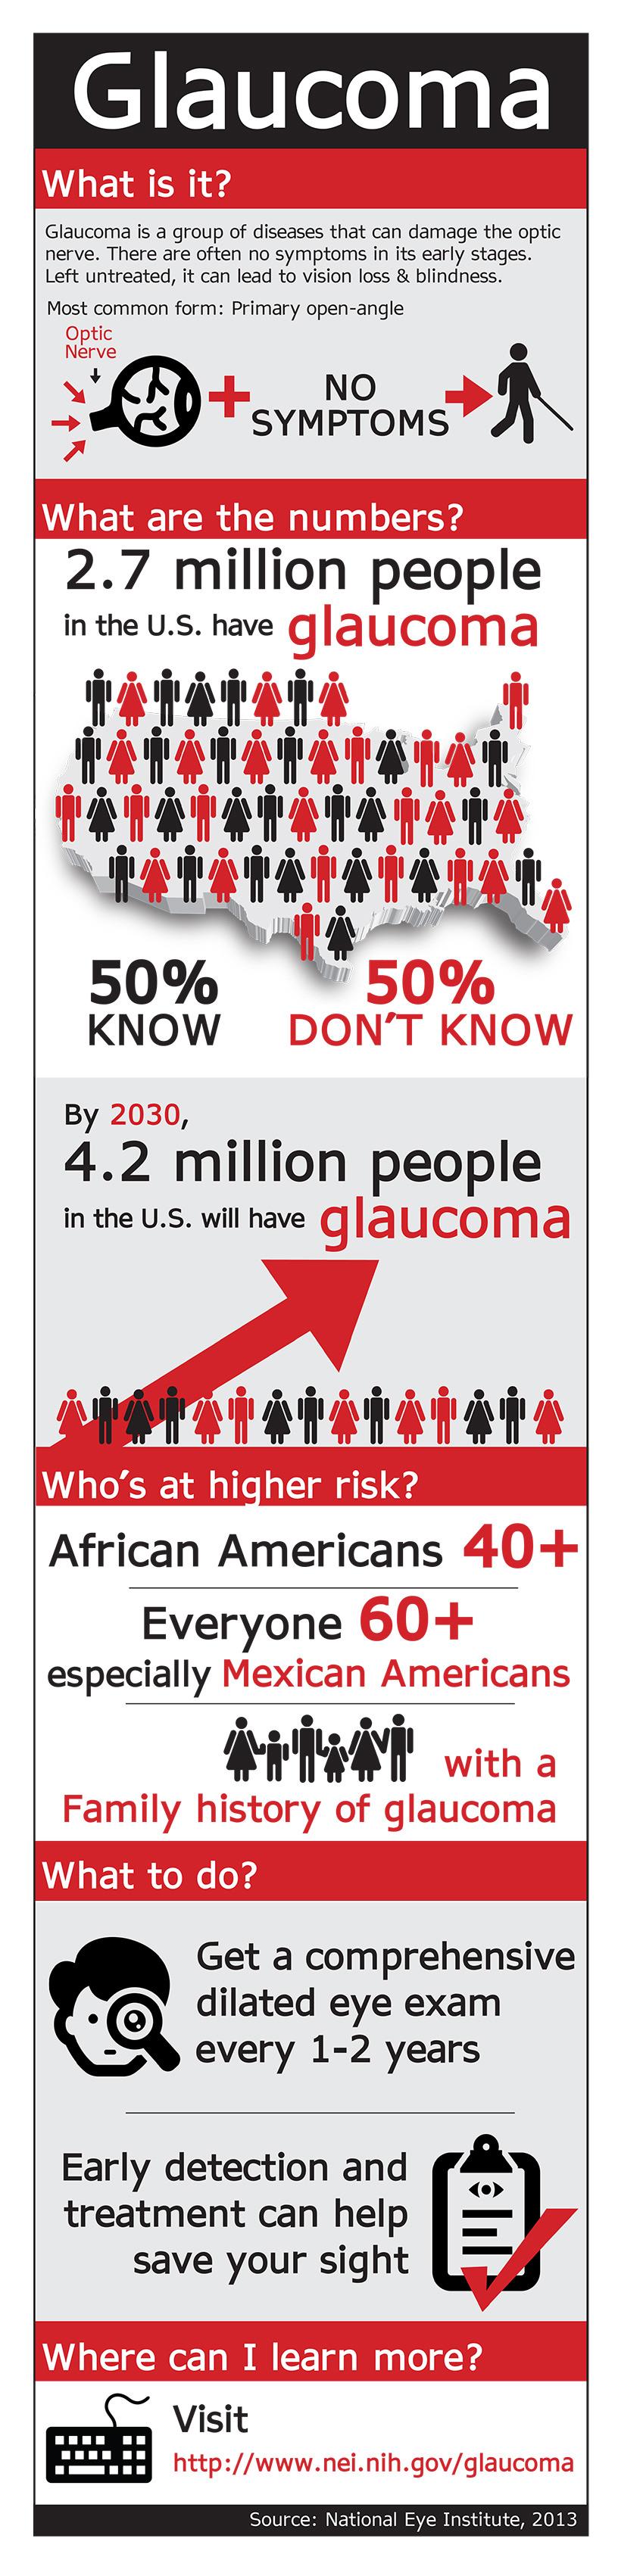 Glaucoma-Awareness-Month-1-1.jpg